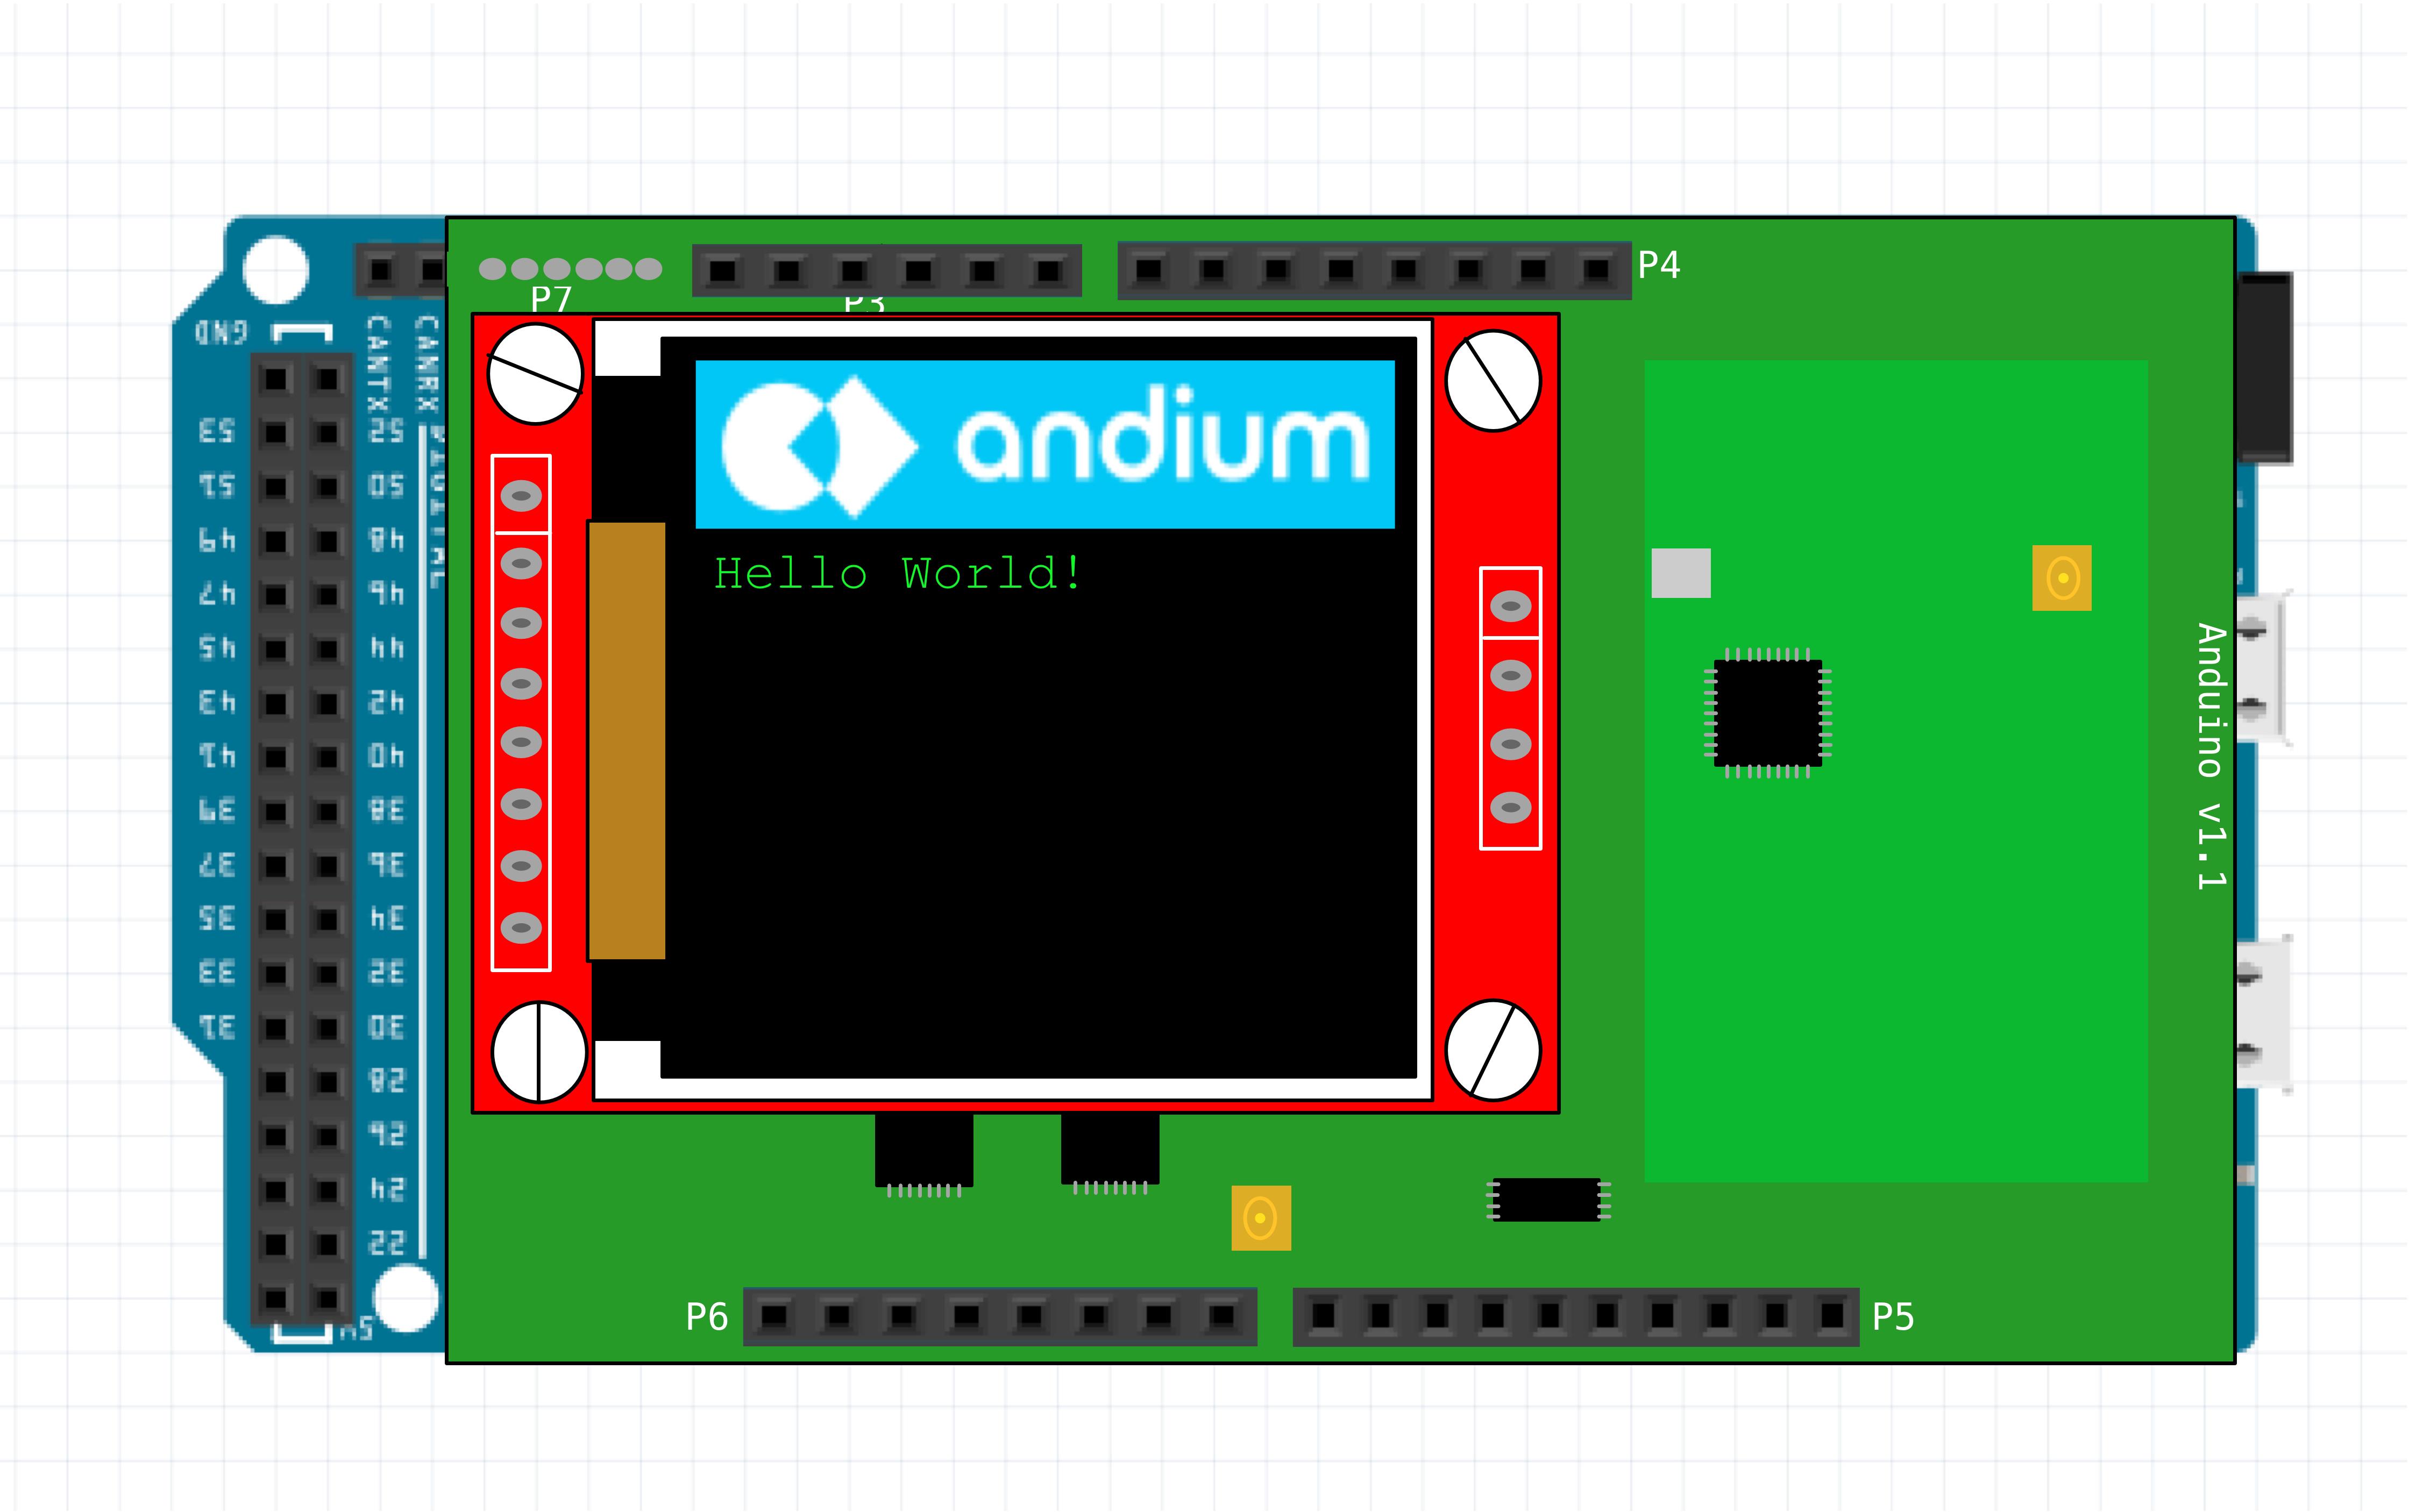 Anduino v1 1 diagram fjqsw9ks53